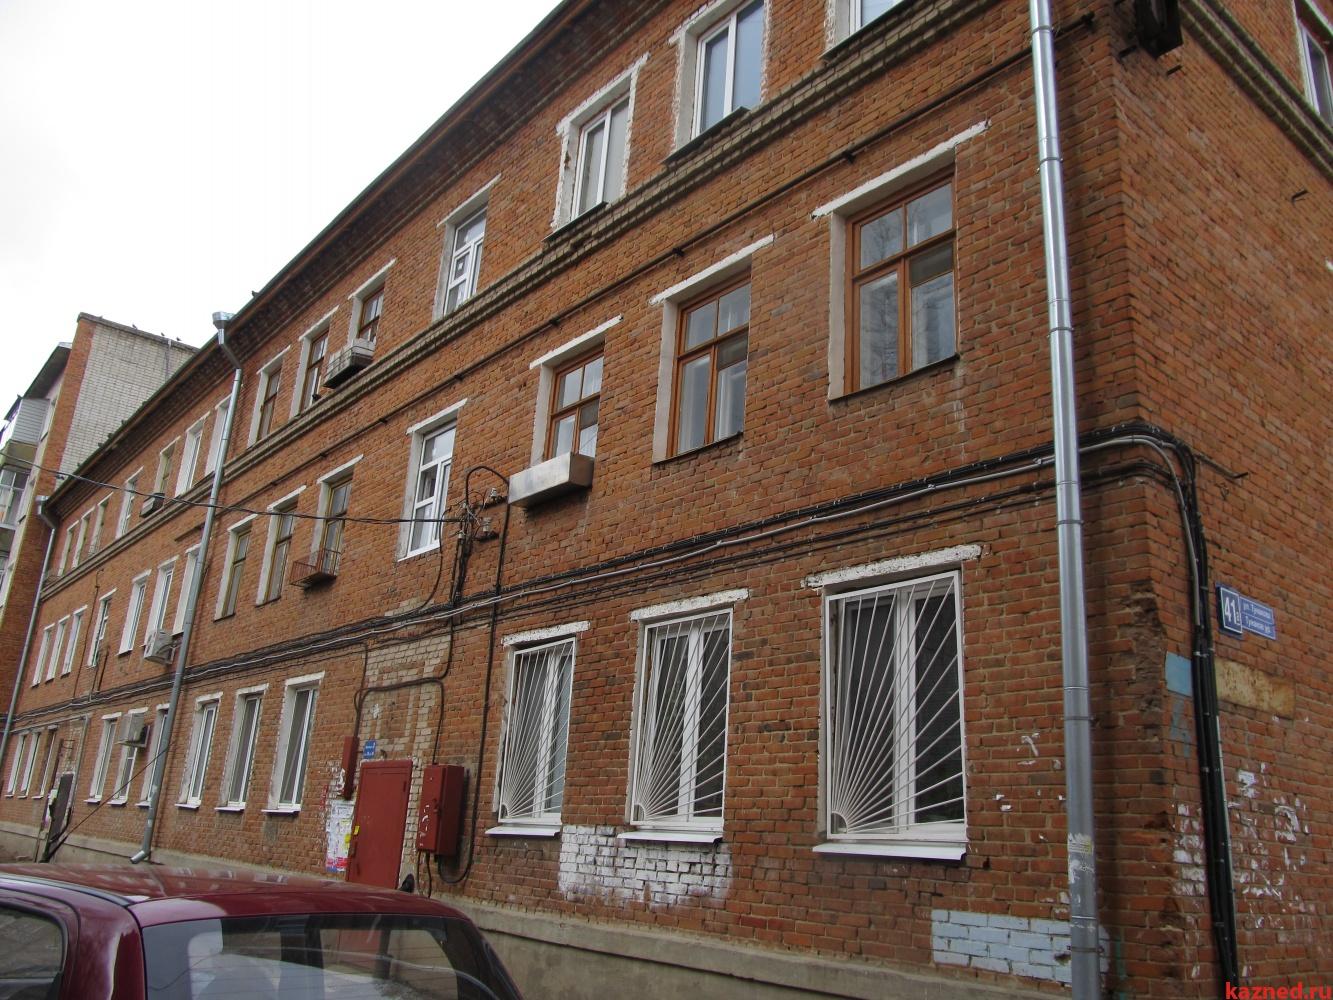 Продажа 2-к квартиры Тунакова, 41А, 39 м²  (миниатюра №5)